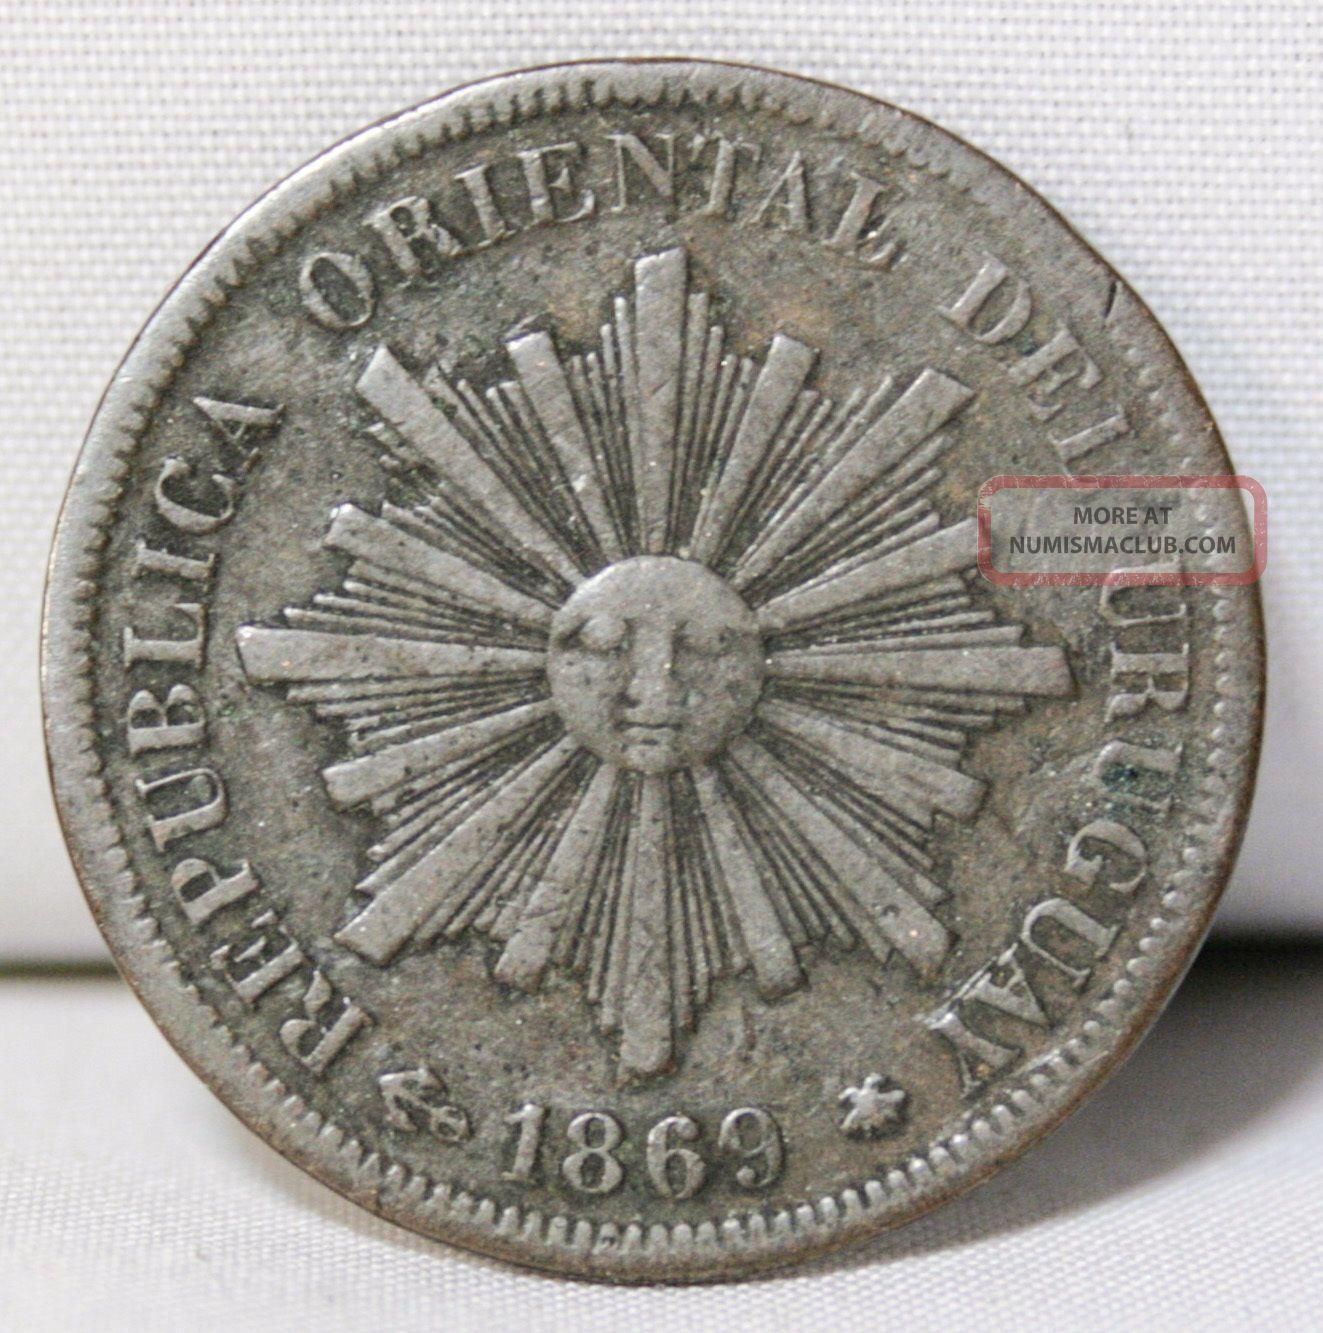 1869 H Republica Oriental Del Uruguay 4 Centesimos Bronze Coin South America photo